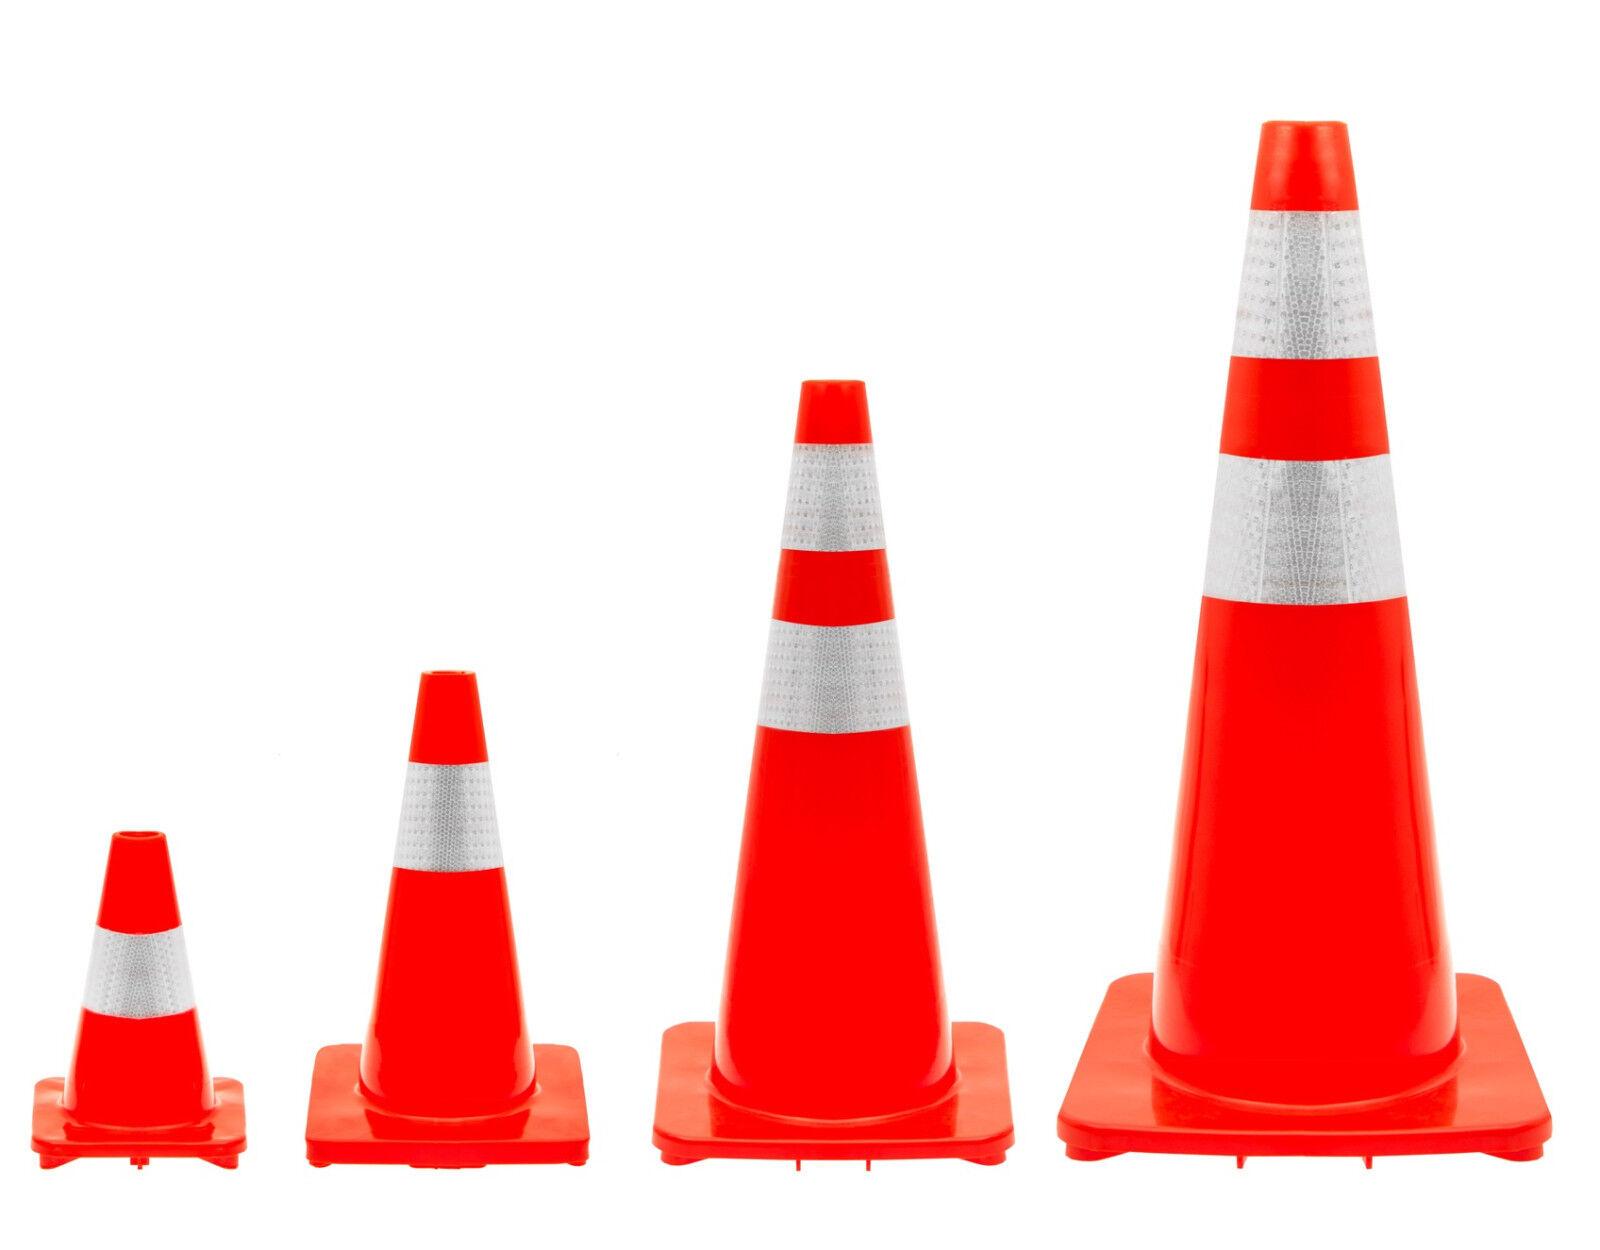 Verkehrsleitkegel Verkehrs Leitkegel Warnleitkegel Verkehrshütchen